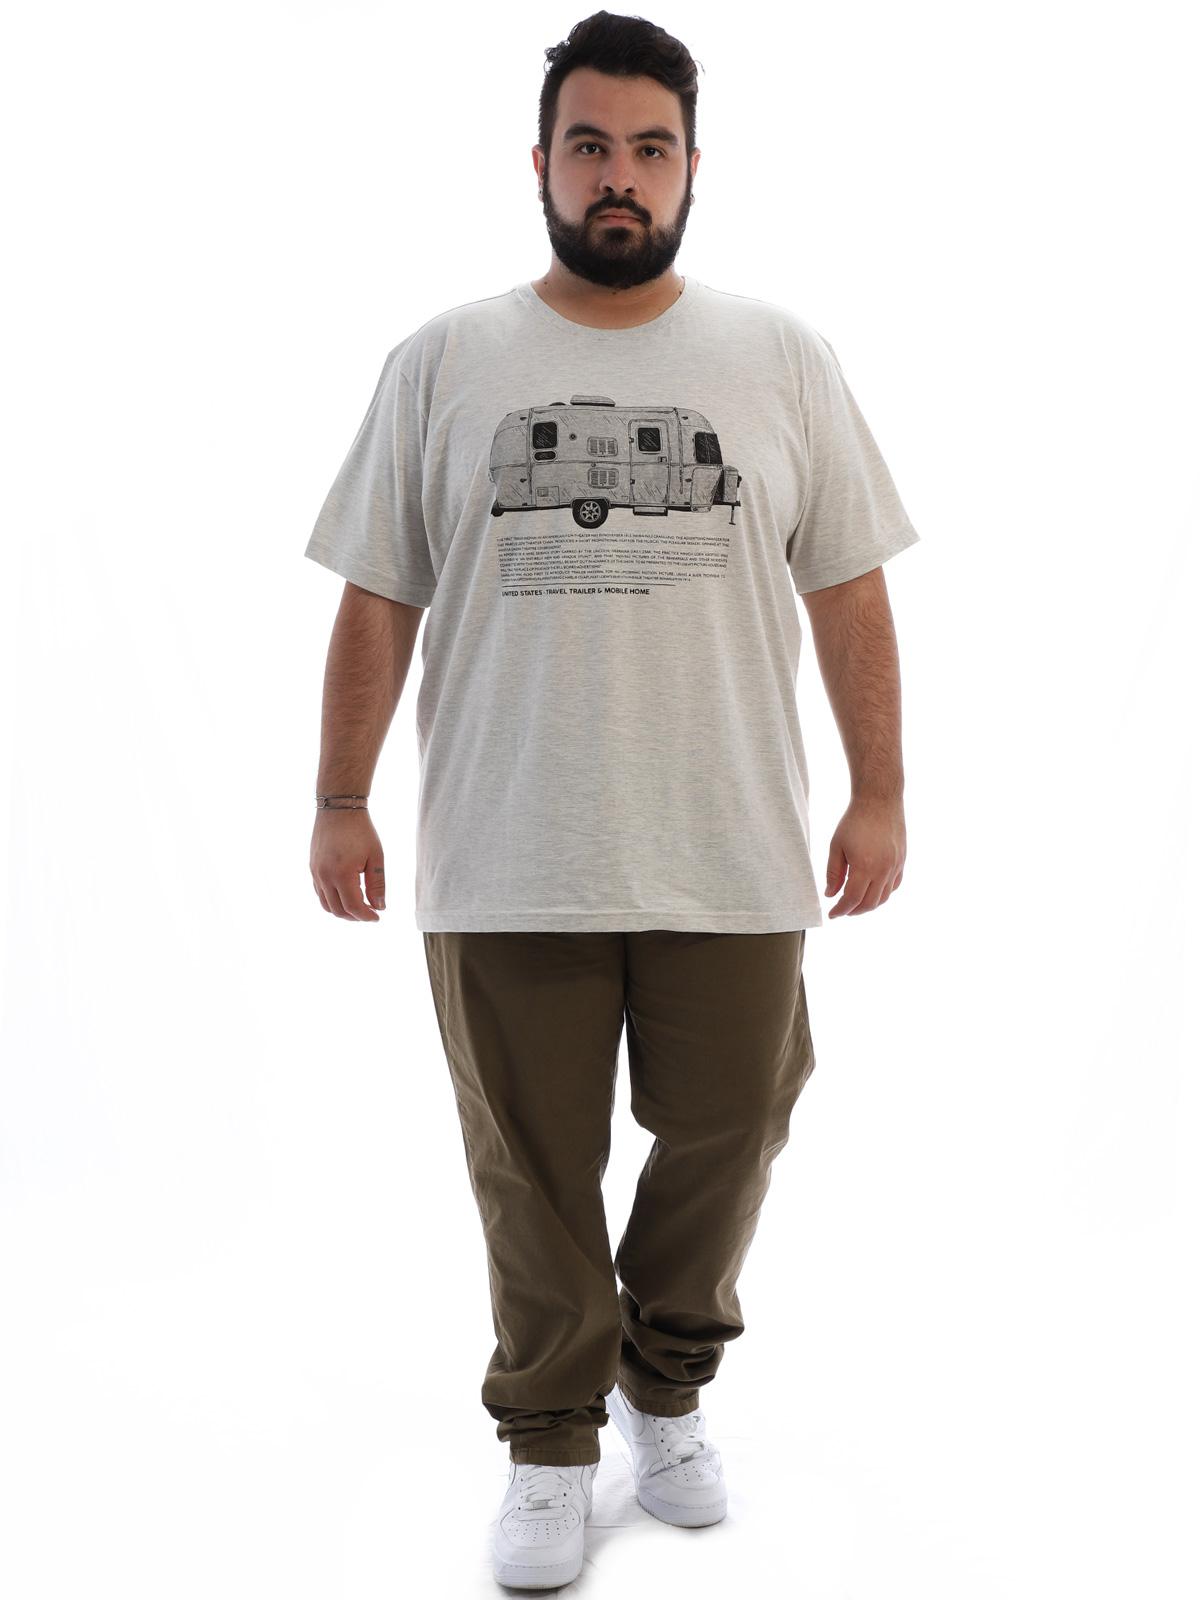 Camiseta Plus Size Masculina Manga Curta Trailer Mescla Cru